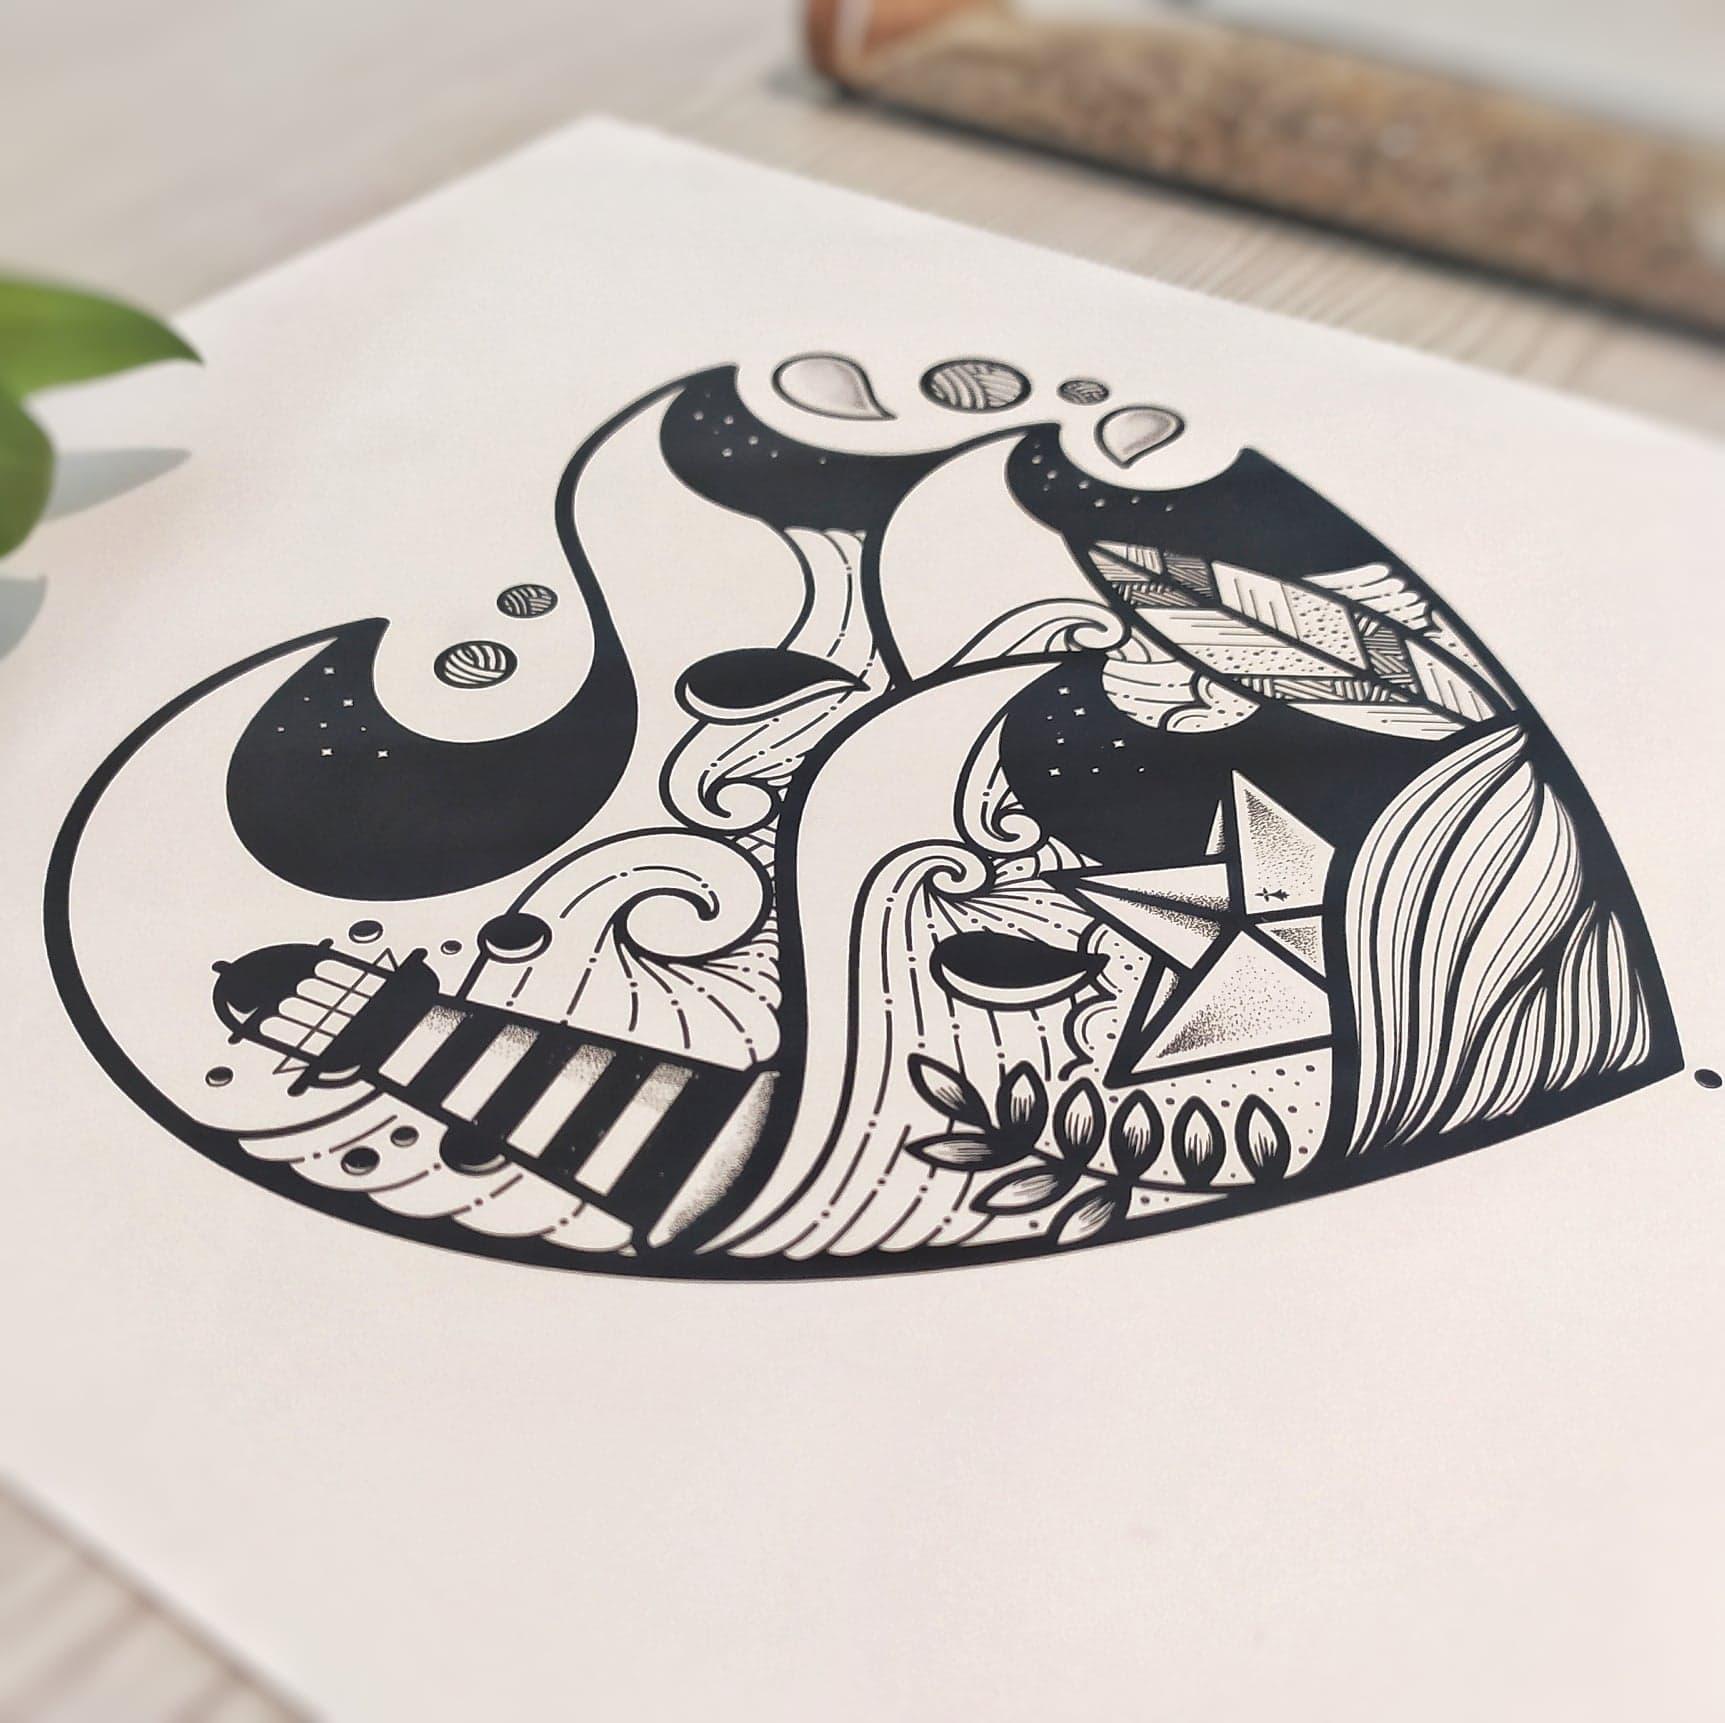 mad-bzh-produits-bretons-illustrations-marines-a4